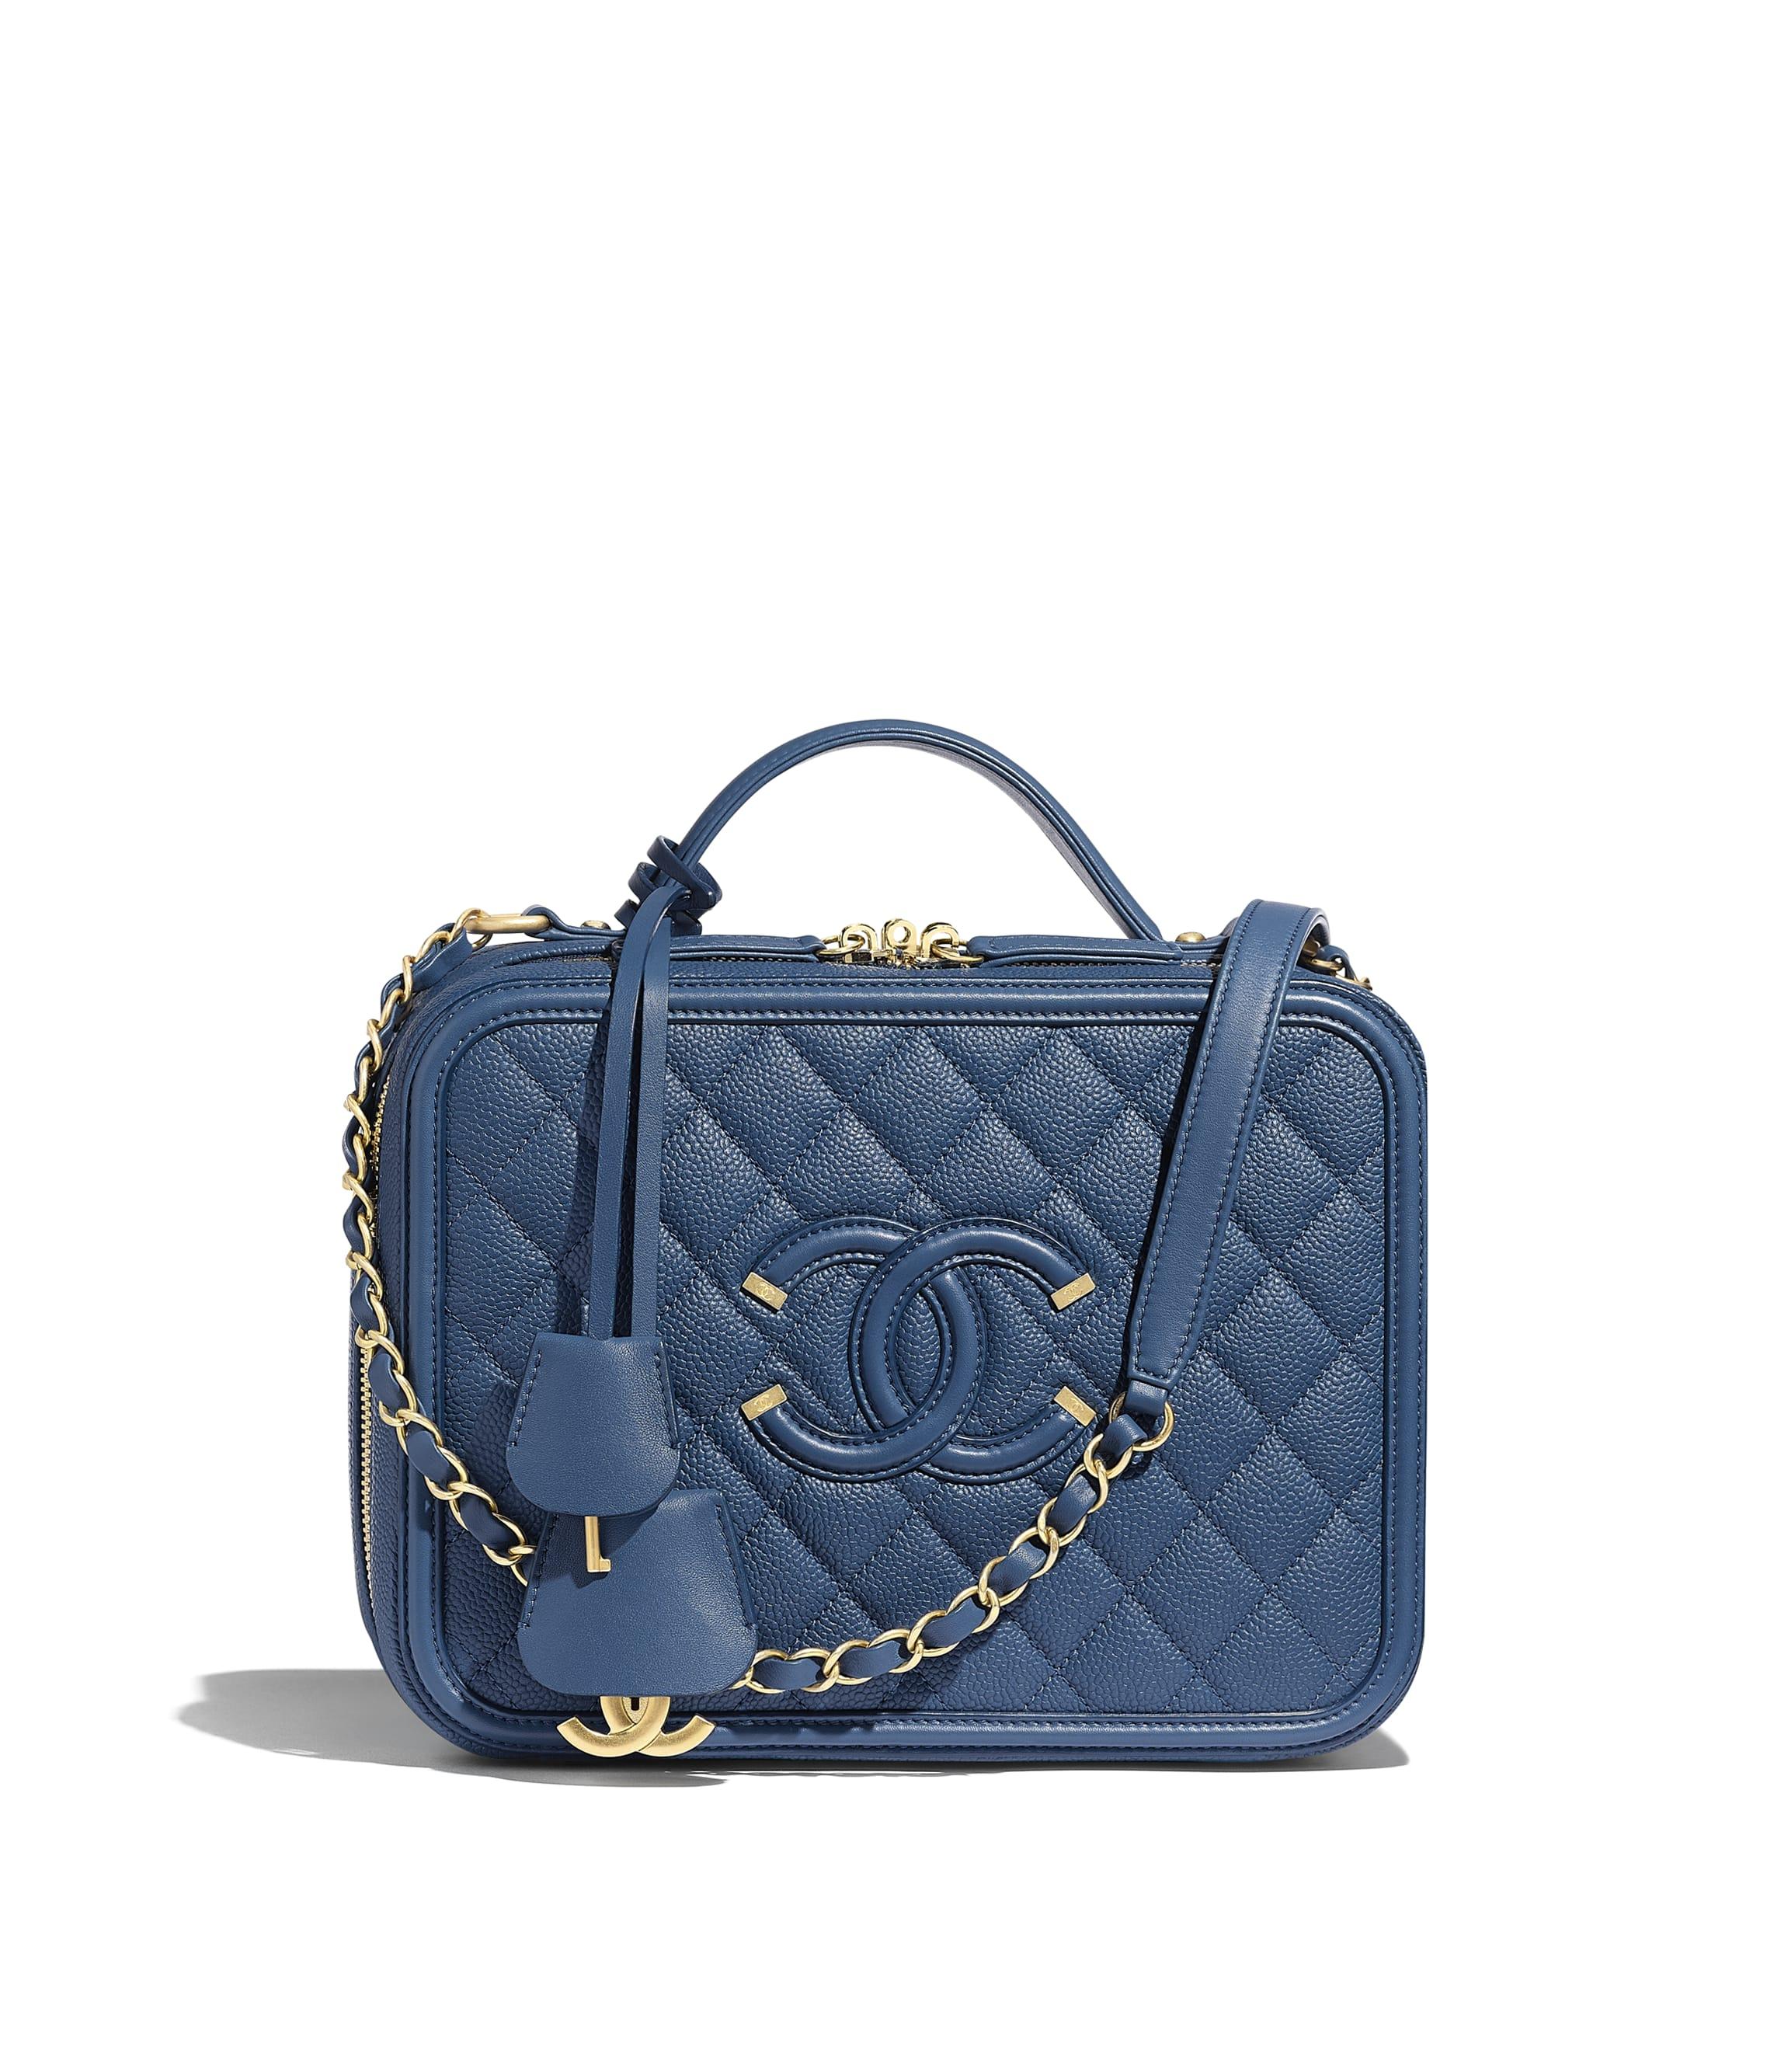 Vanity Cases Handbags Chanel